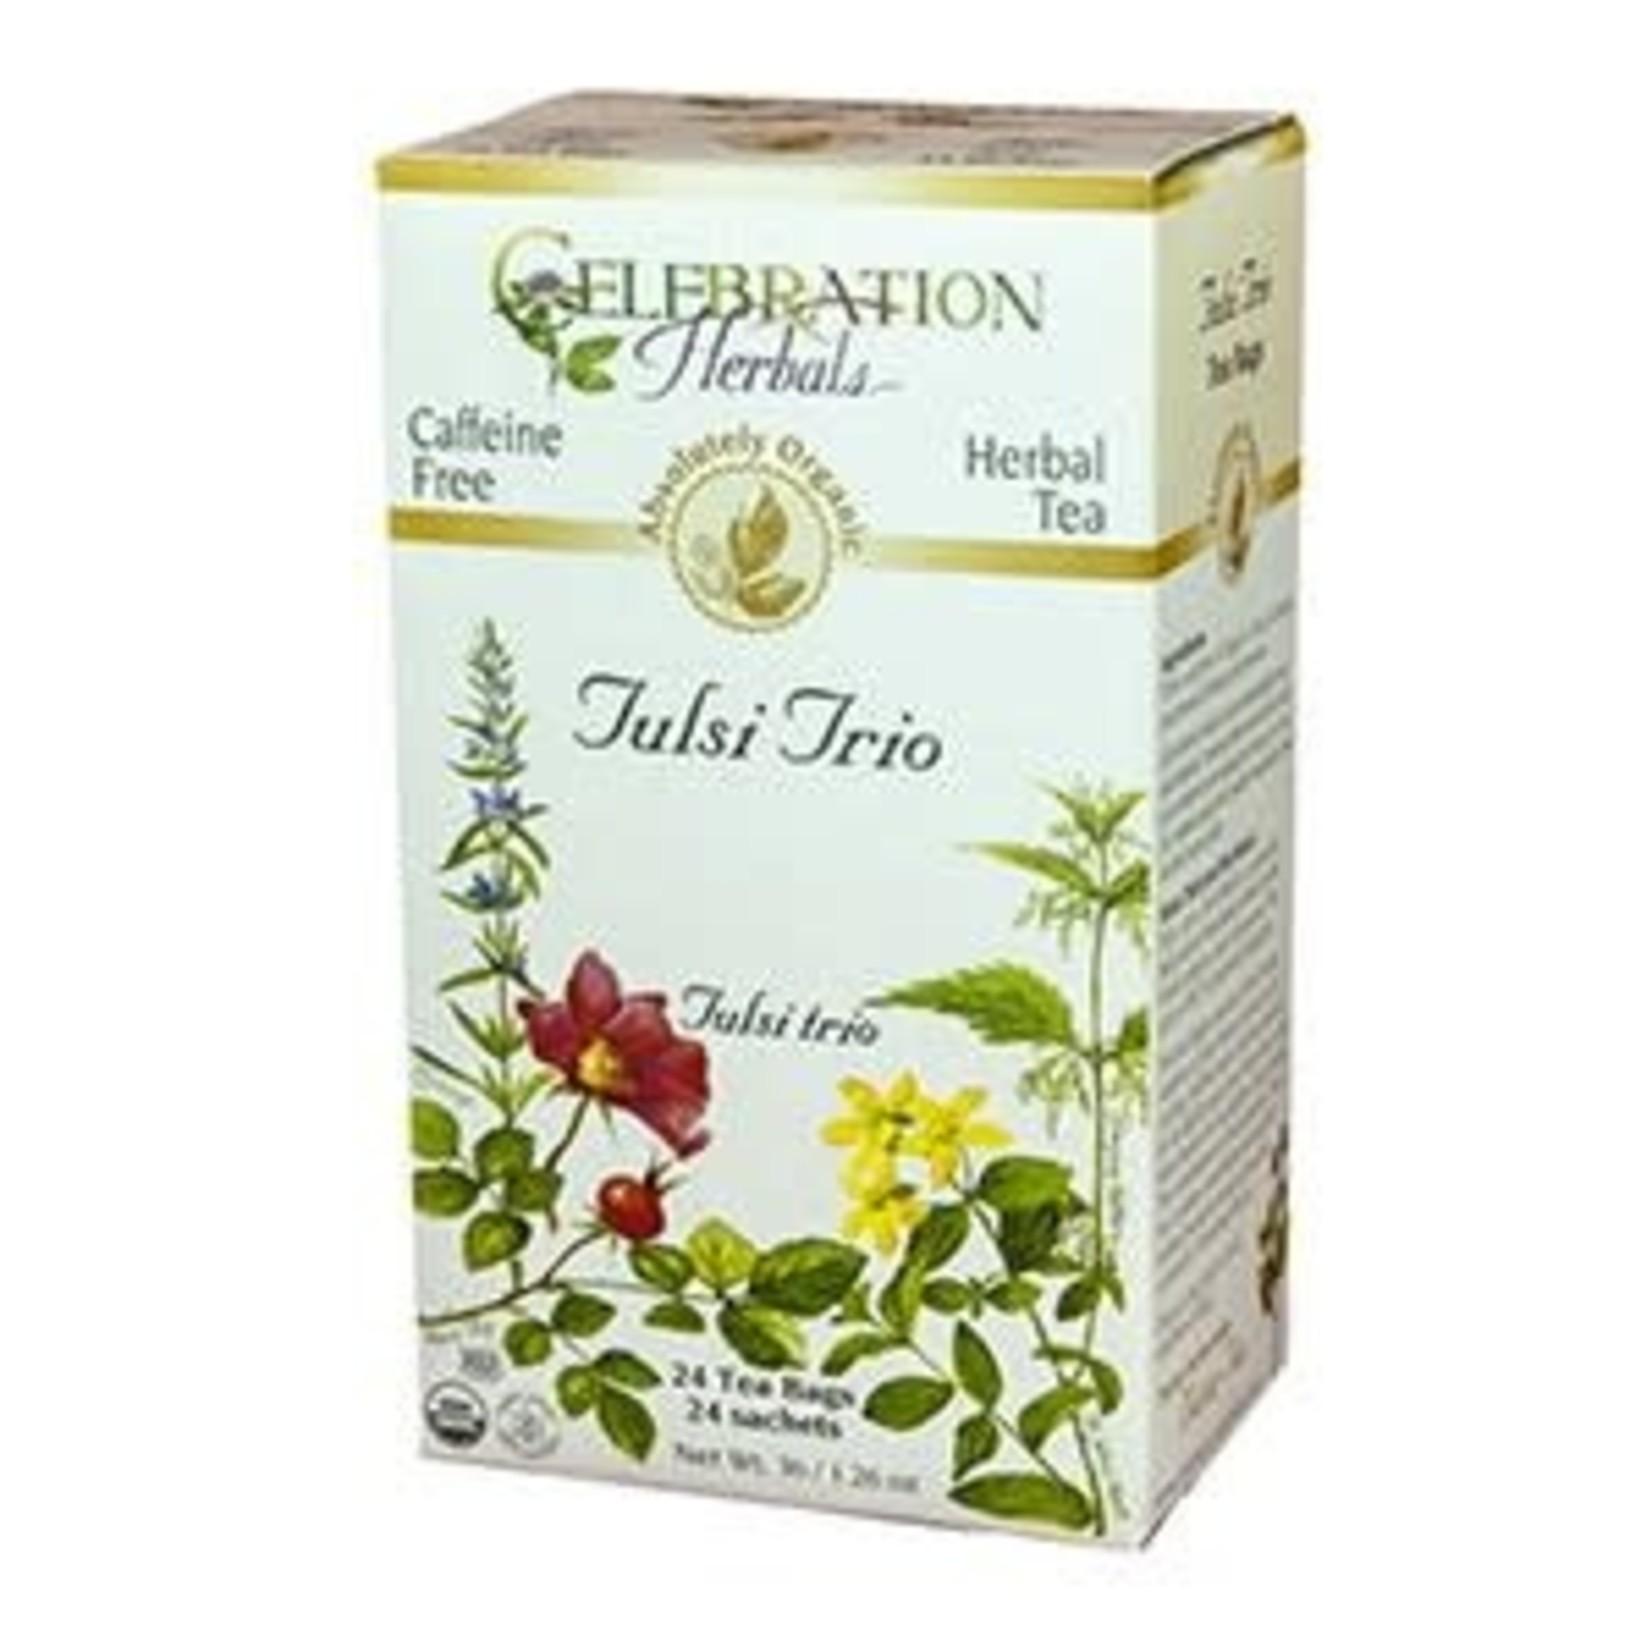 Celebration Herbals Celebration Herbals Tulsi Trio Tea 24 Tea Bags